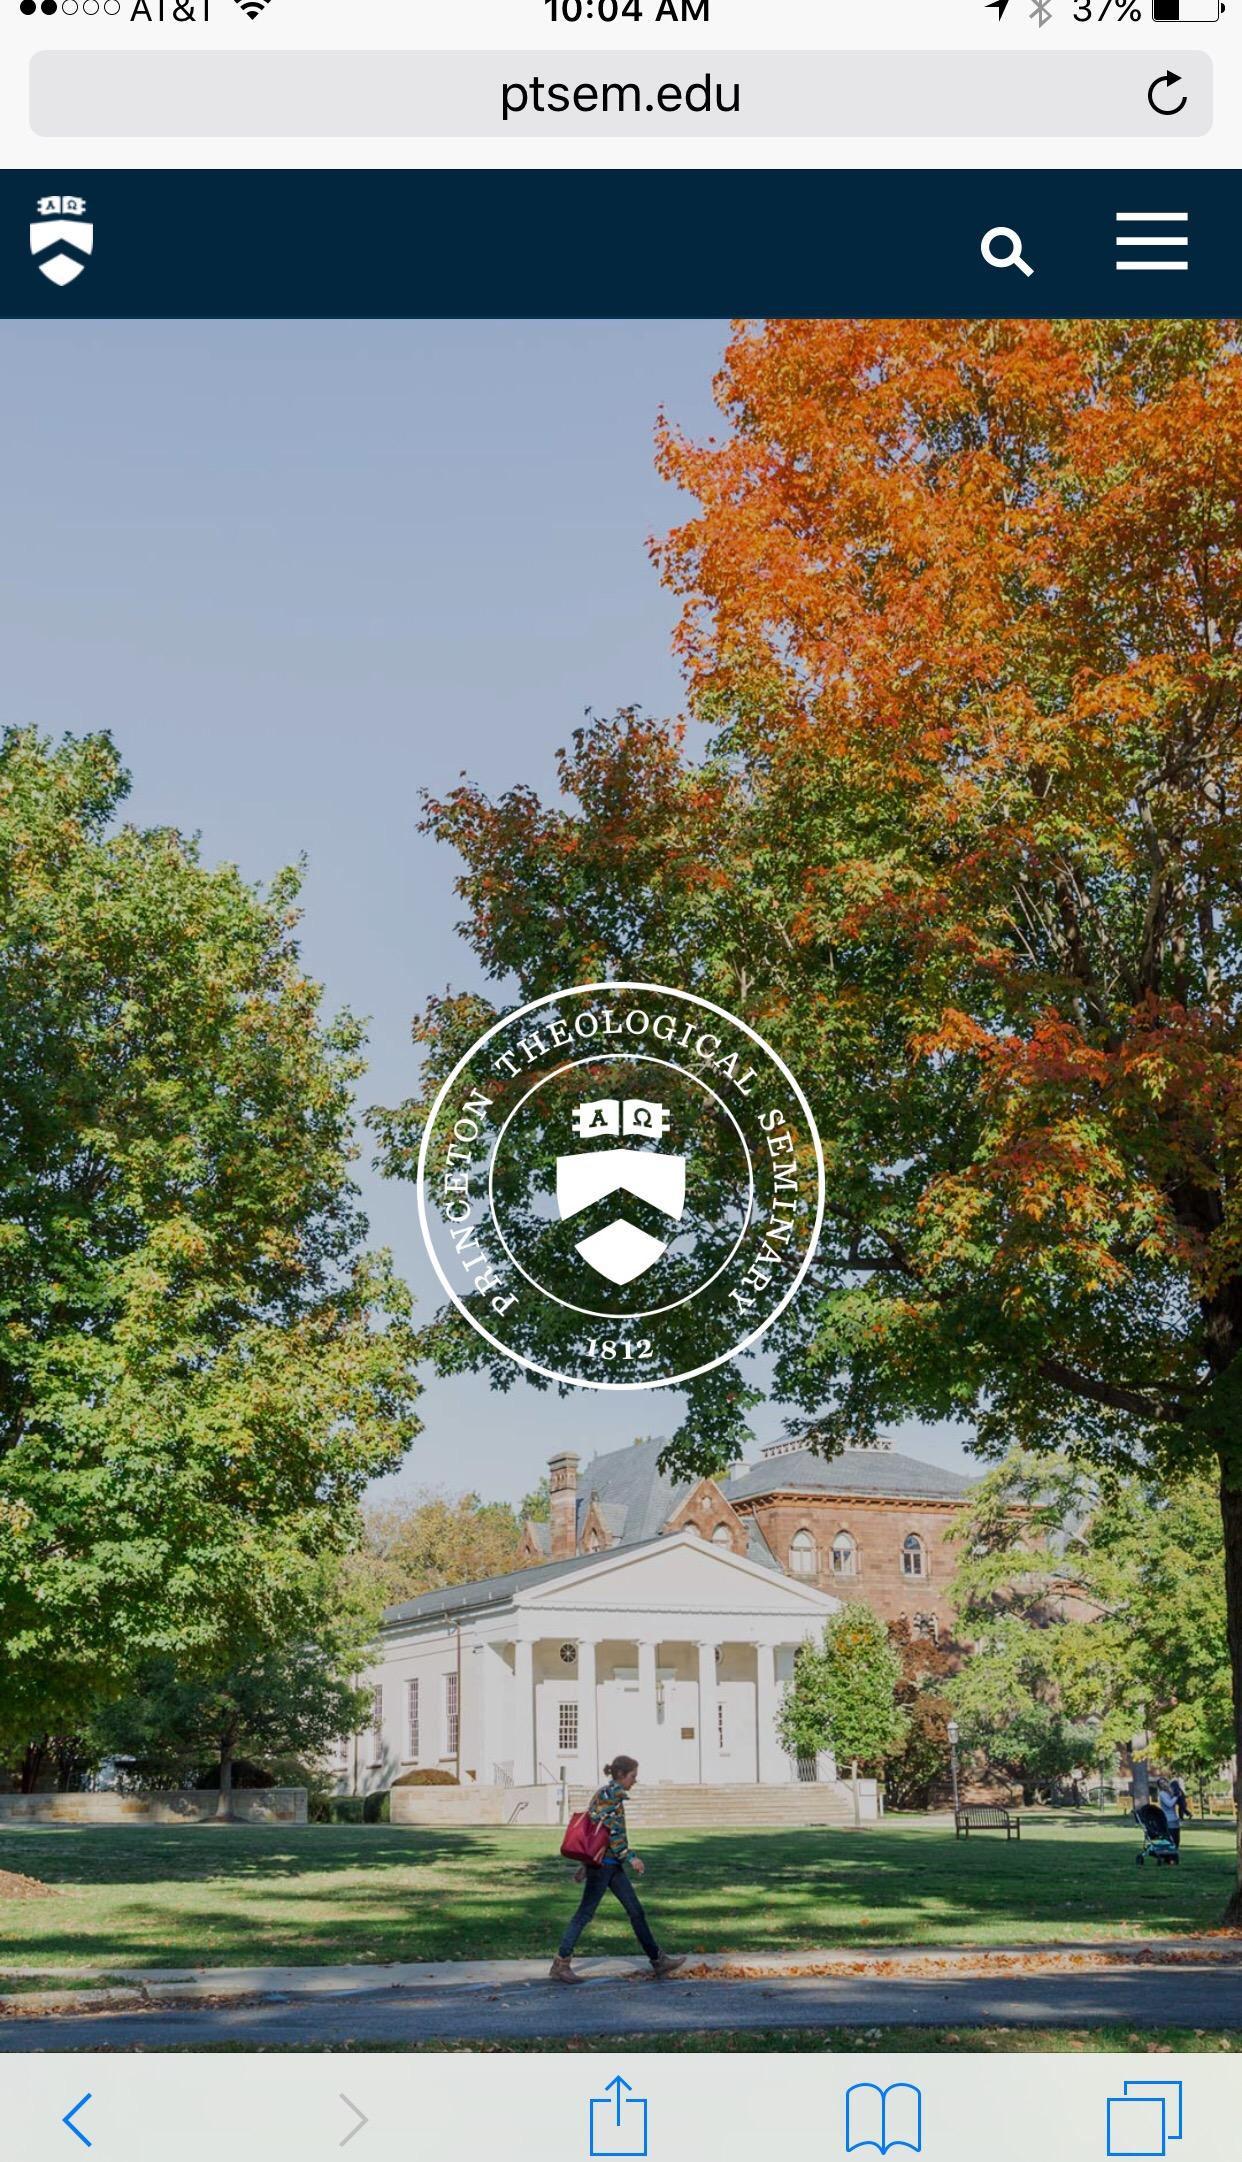 princeton theological seminary website